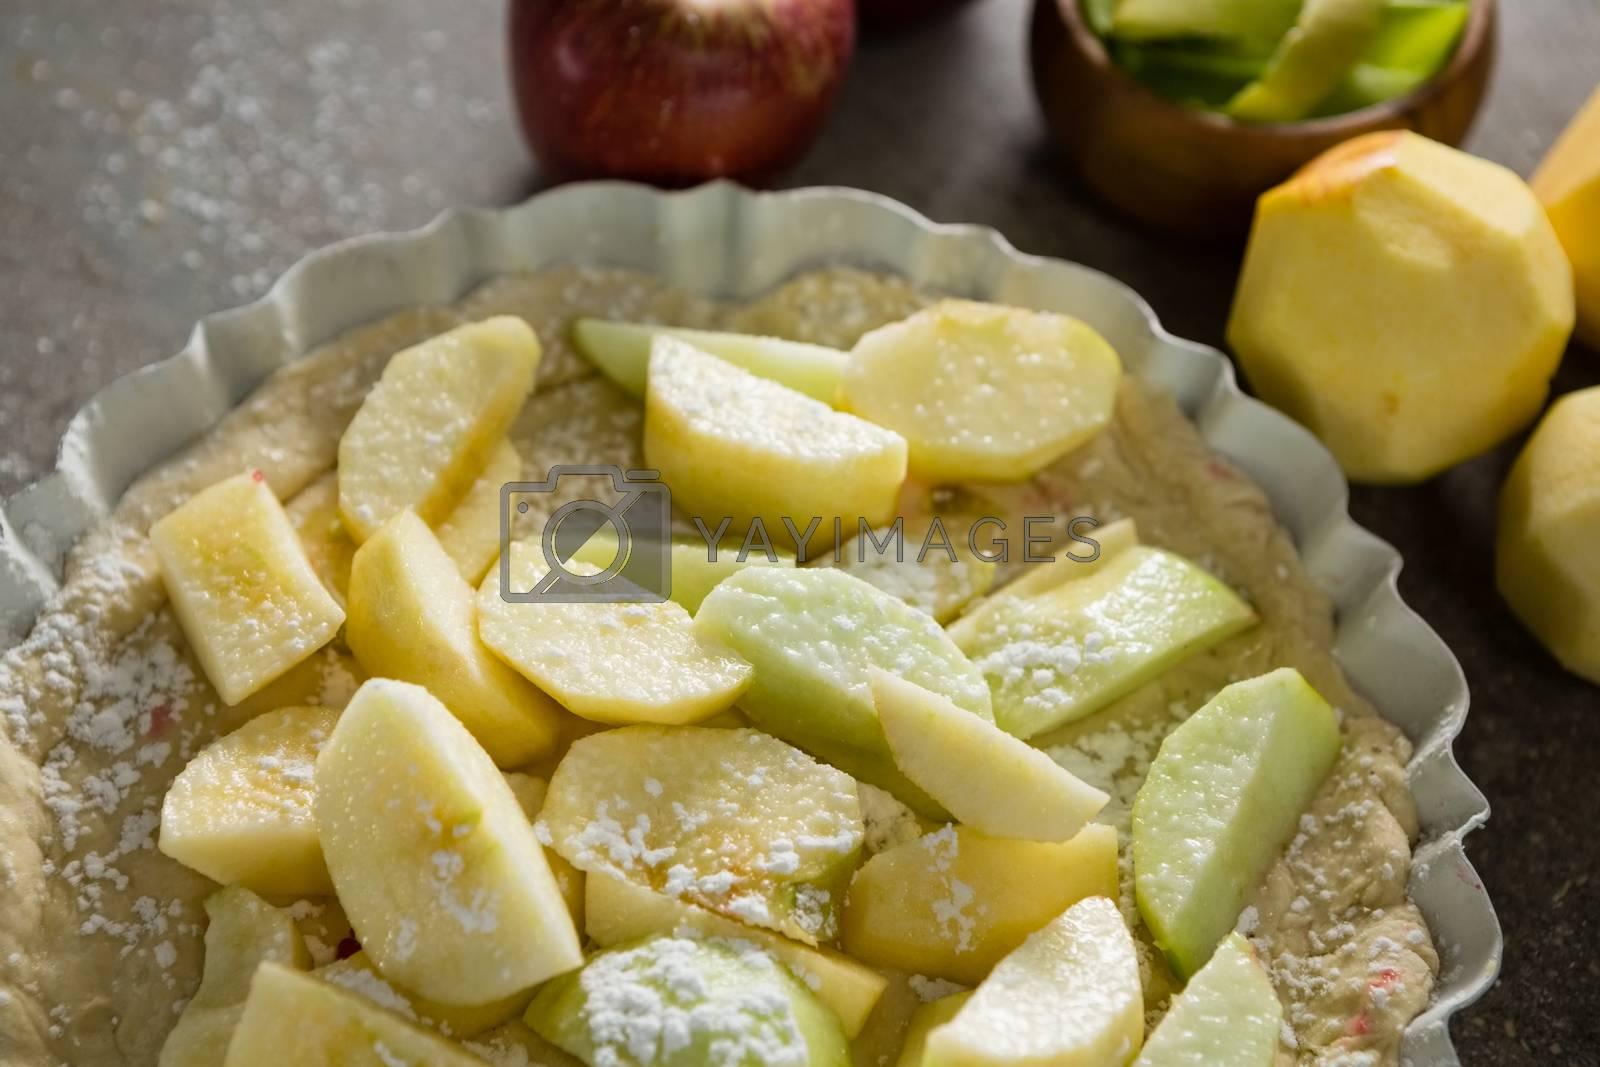 Slice of apple on tart with icing sugar by Wavebreakmedia